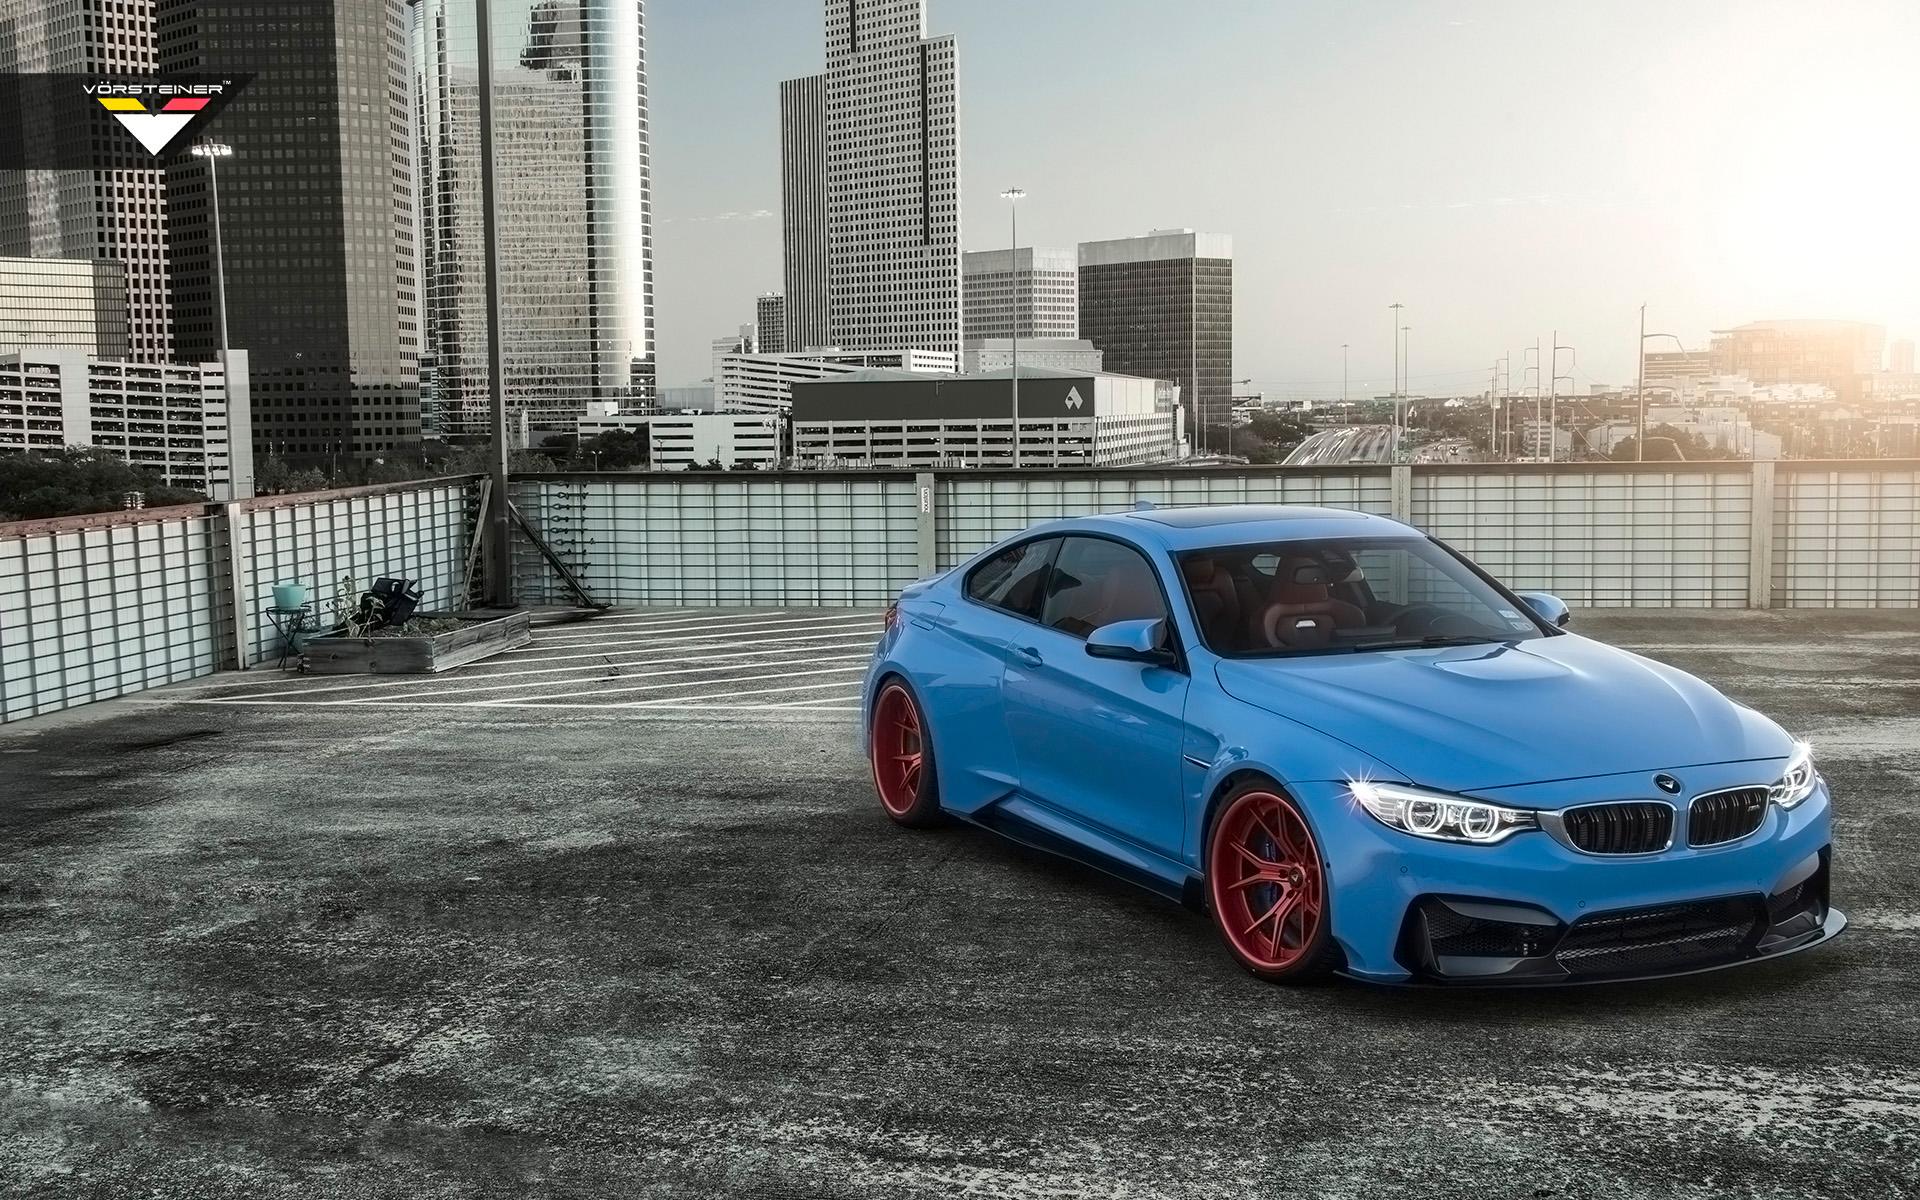 ... Vorsteiner BMW M4 GTRS4 Yas Marina Blue Wallpaper | HD Car Wallpapers